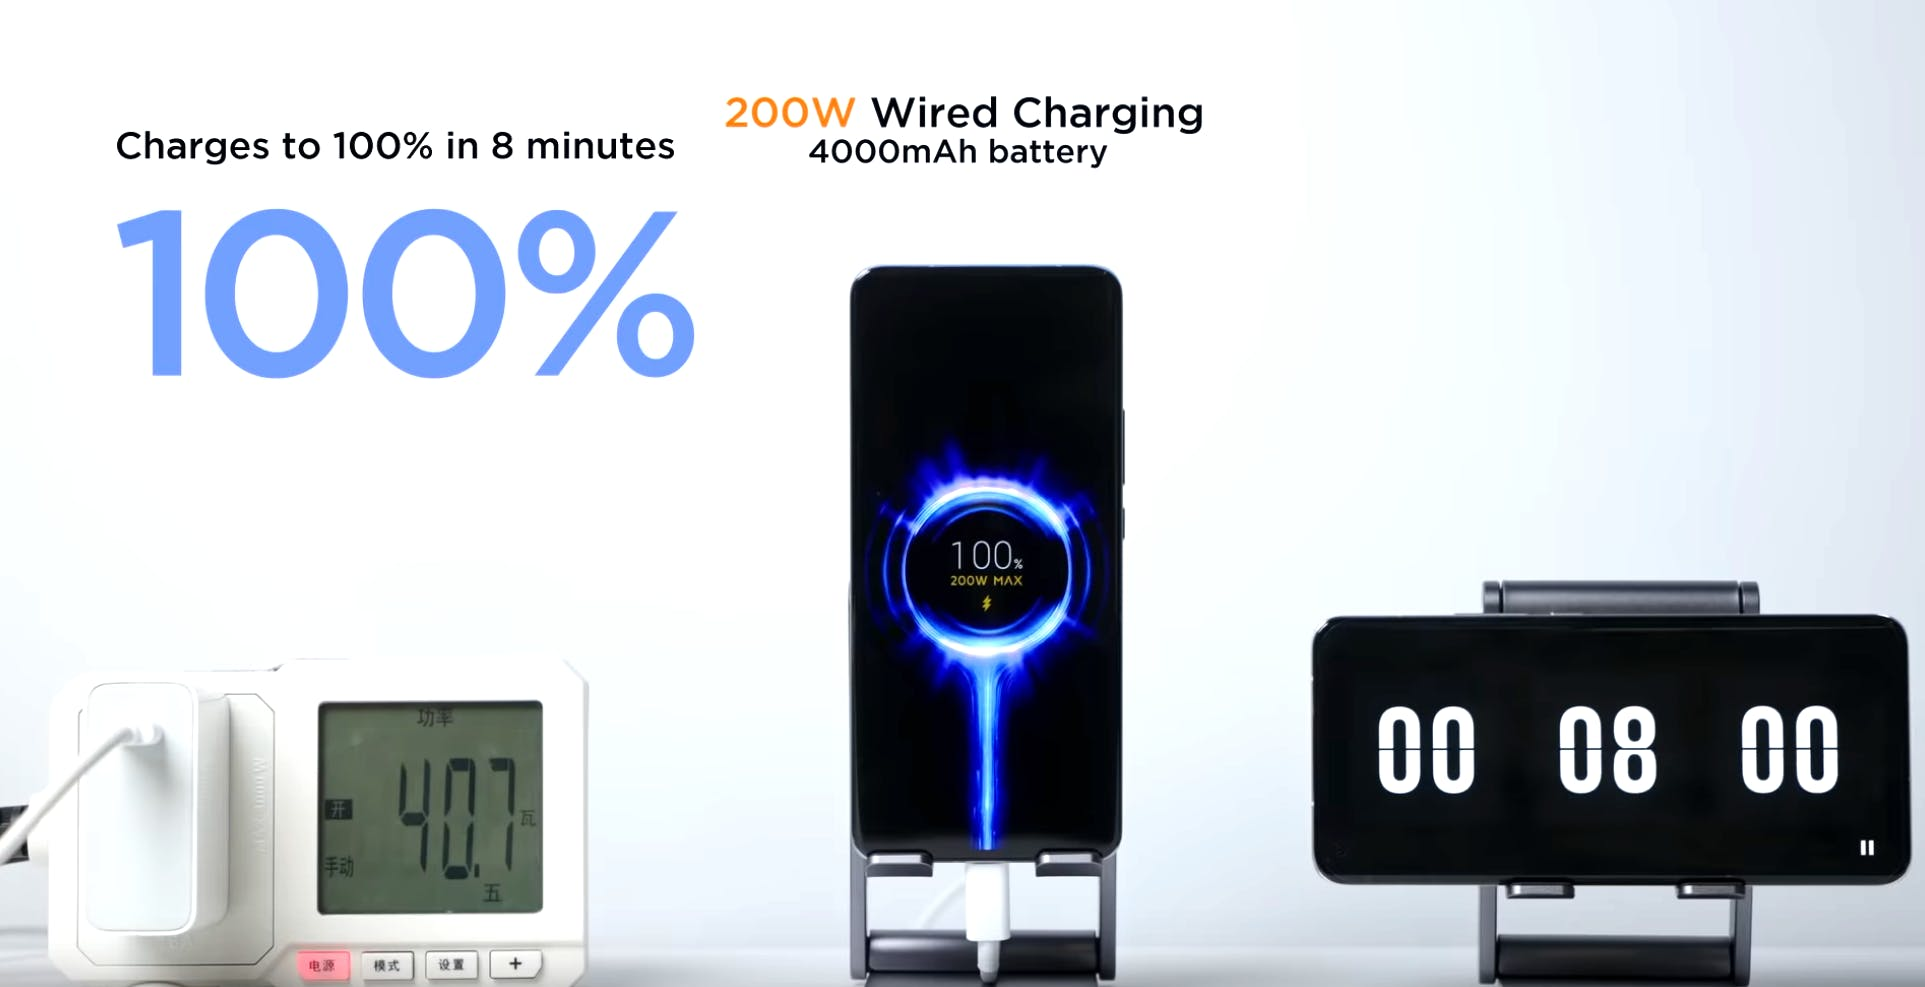 Xiaomi spaventosa: 200 W di ricarica cablata, telefono al 100% in 8 minuti